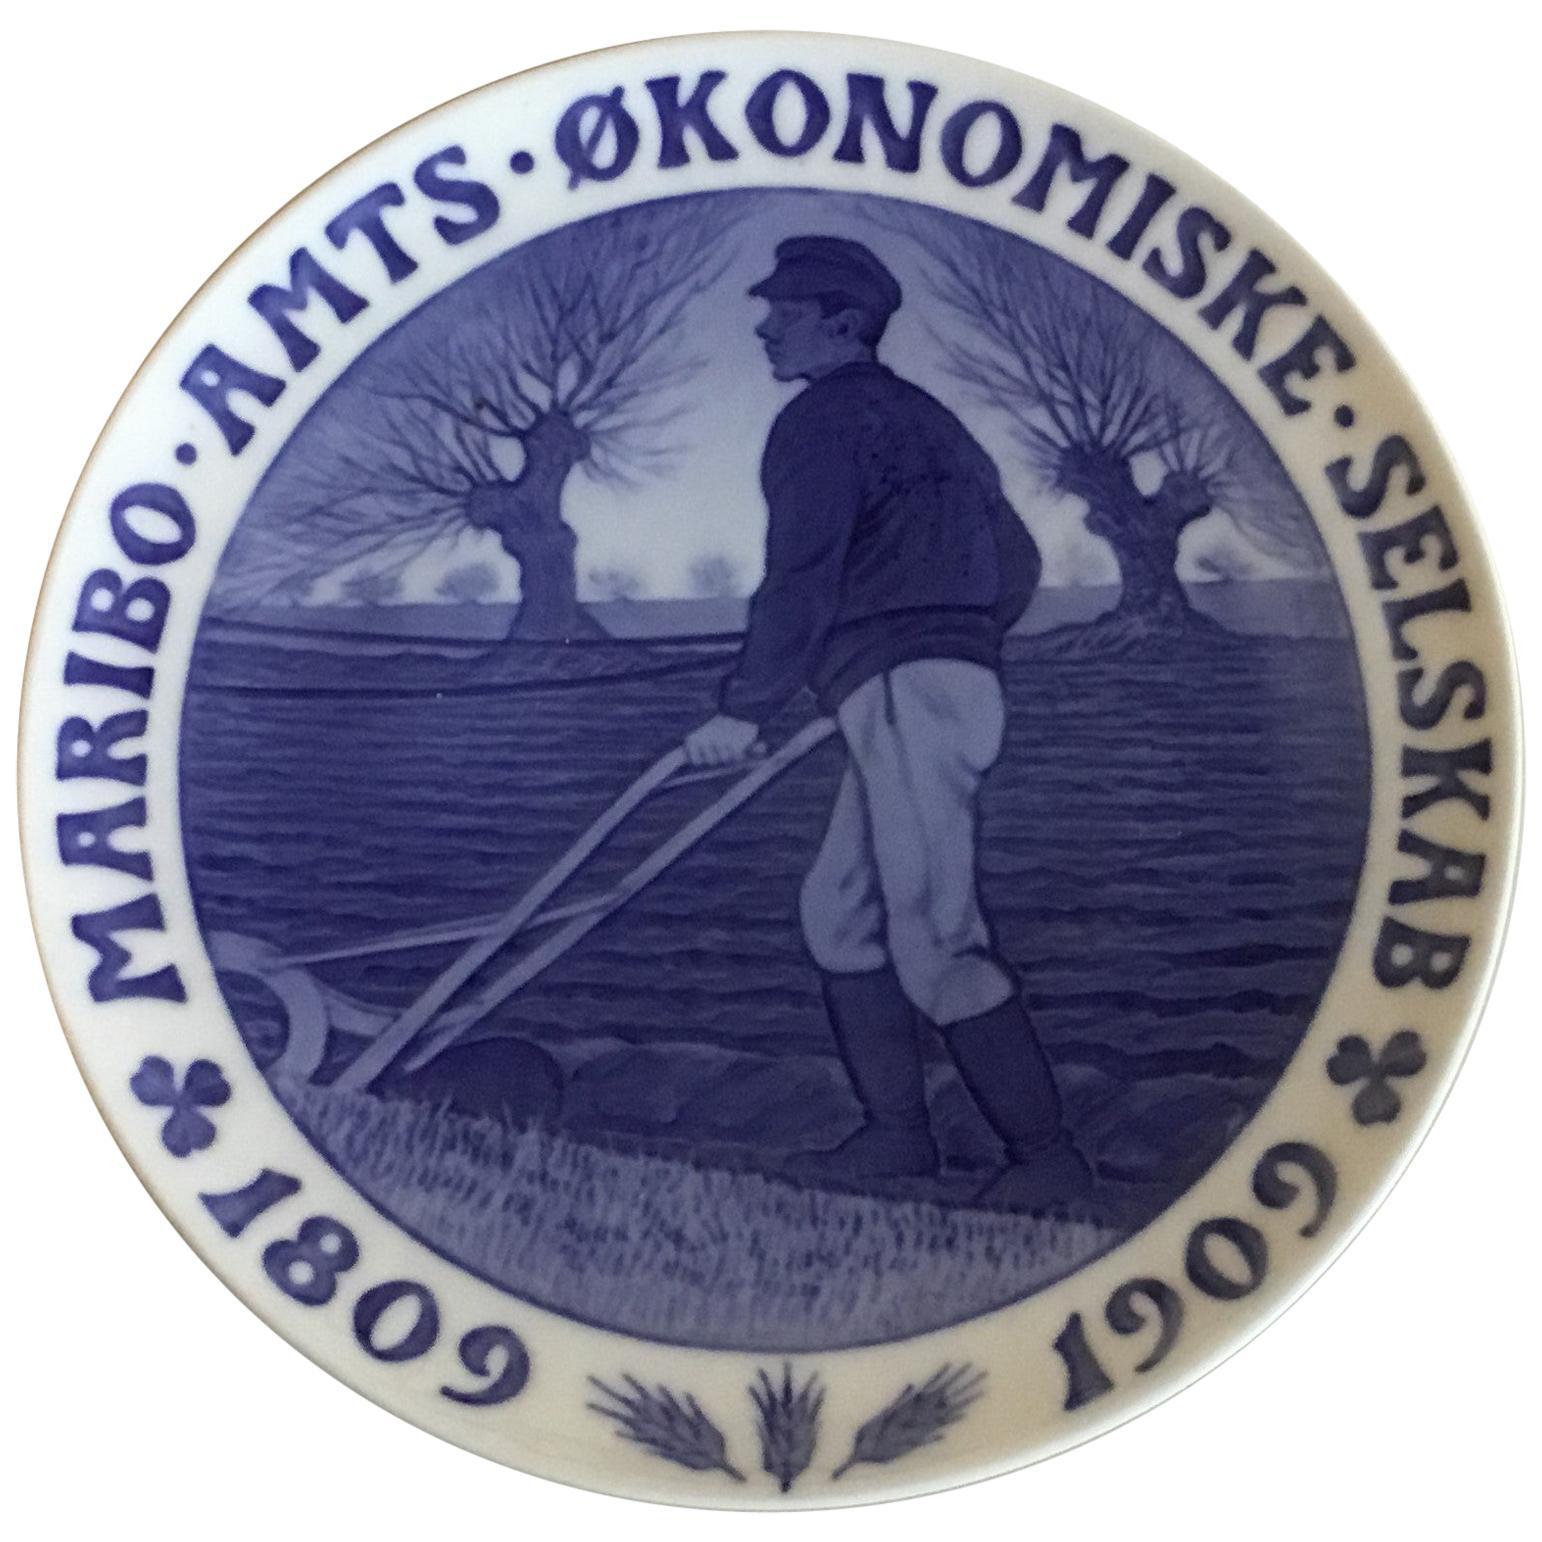 Royal Copenhagen Commemorative Plate from 1909 RC-CM93